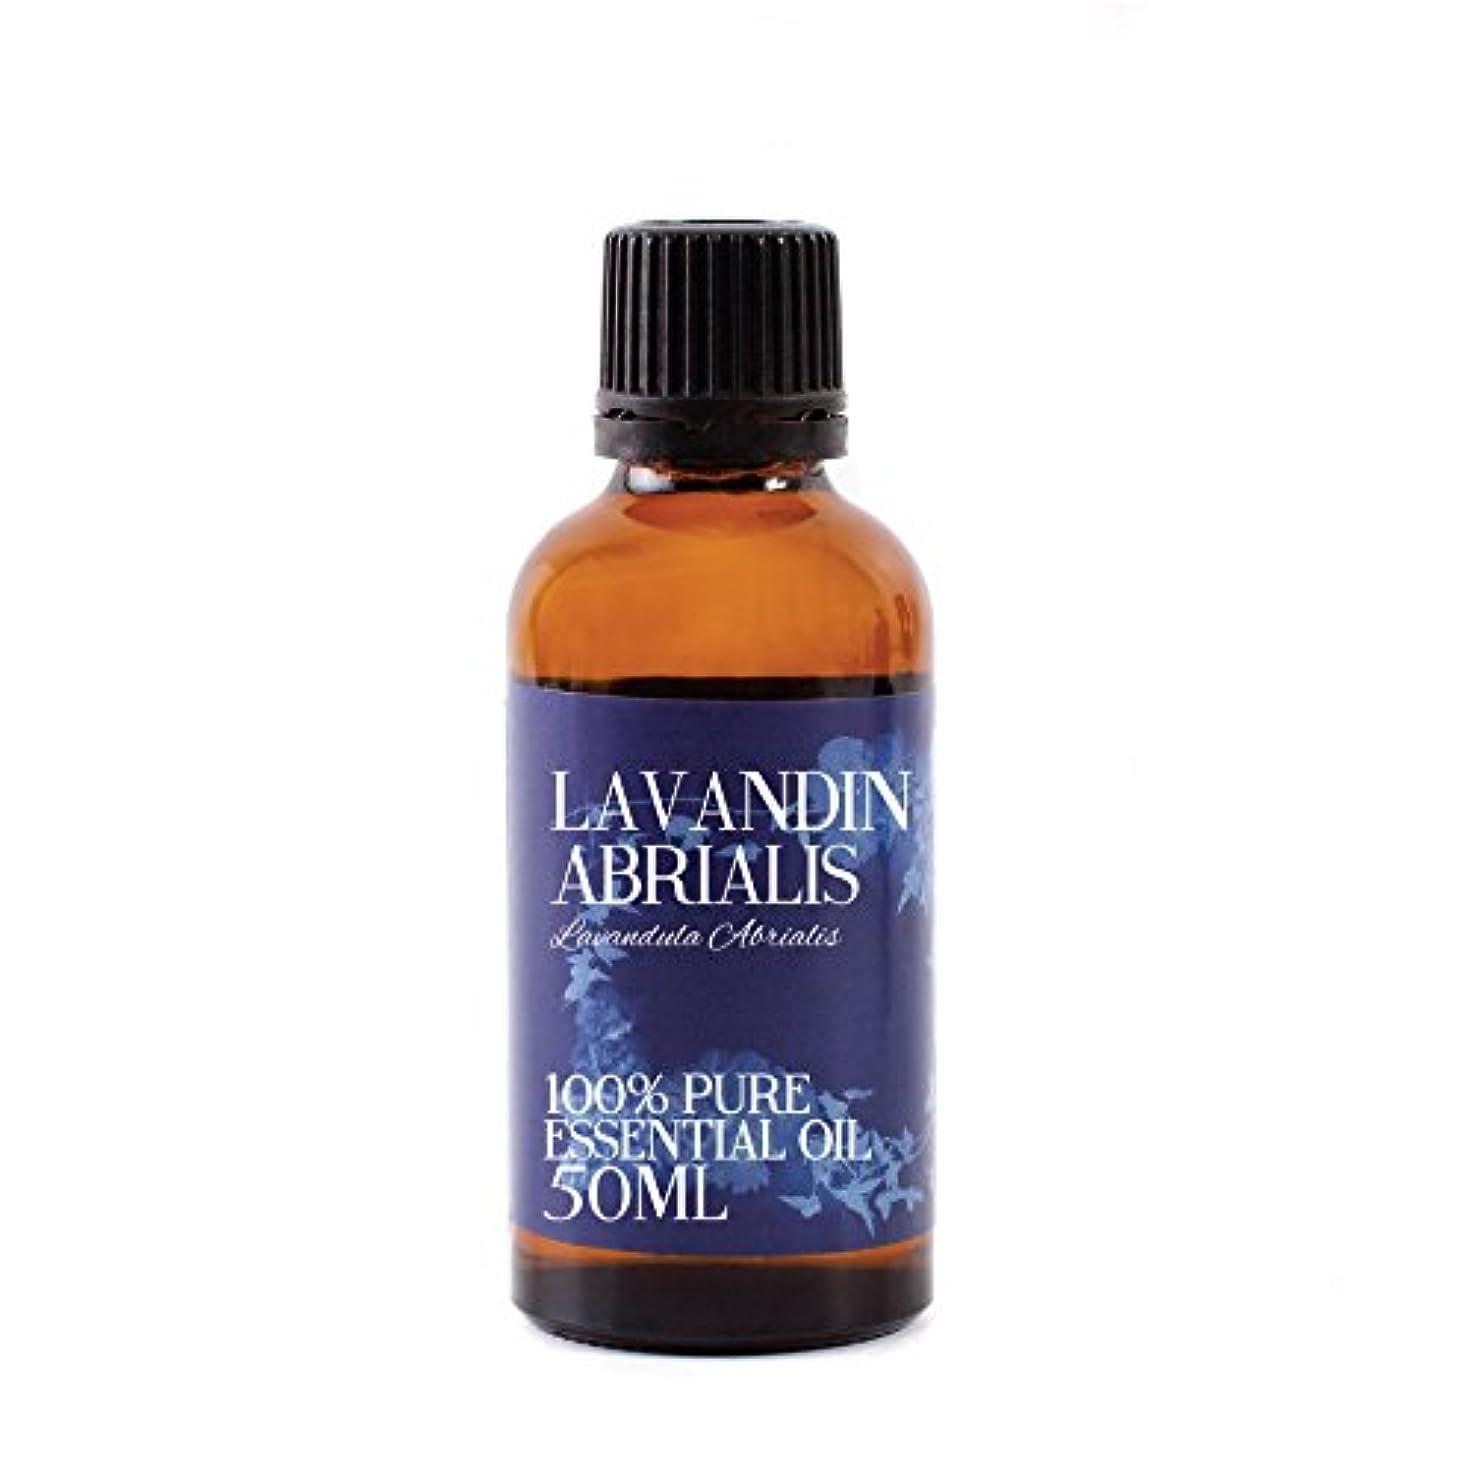 突撃加速度誠実Mystic Moments   Lavandin Abrialis Essential Oil - 50ml - 100% Pure